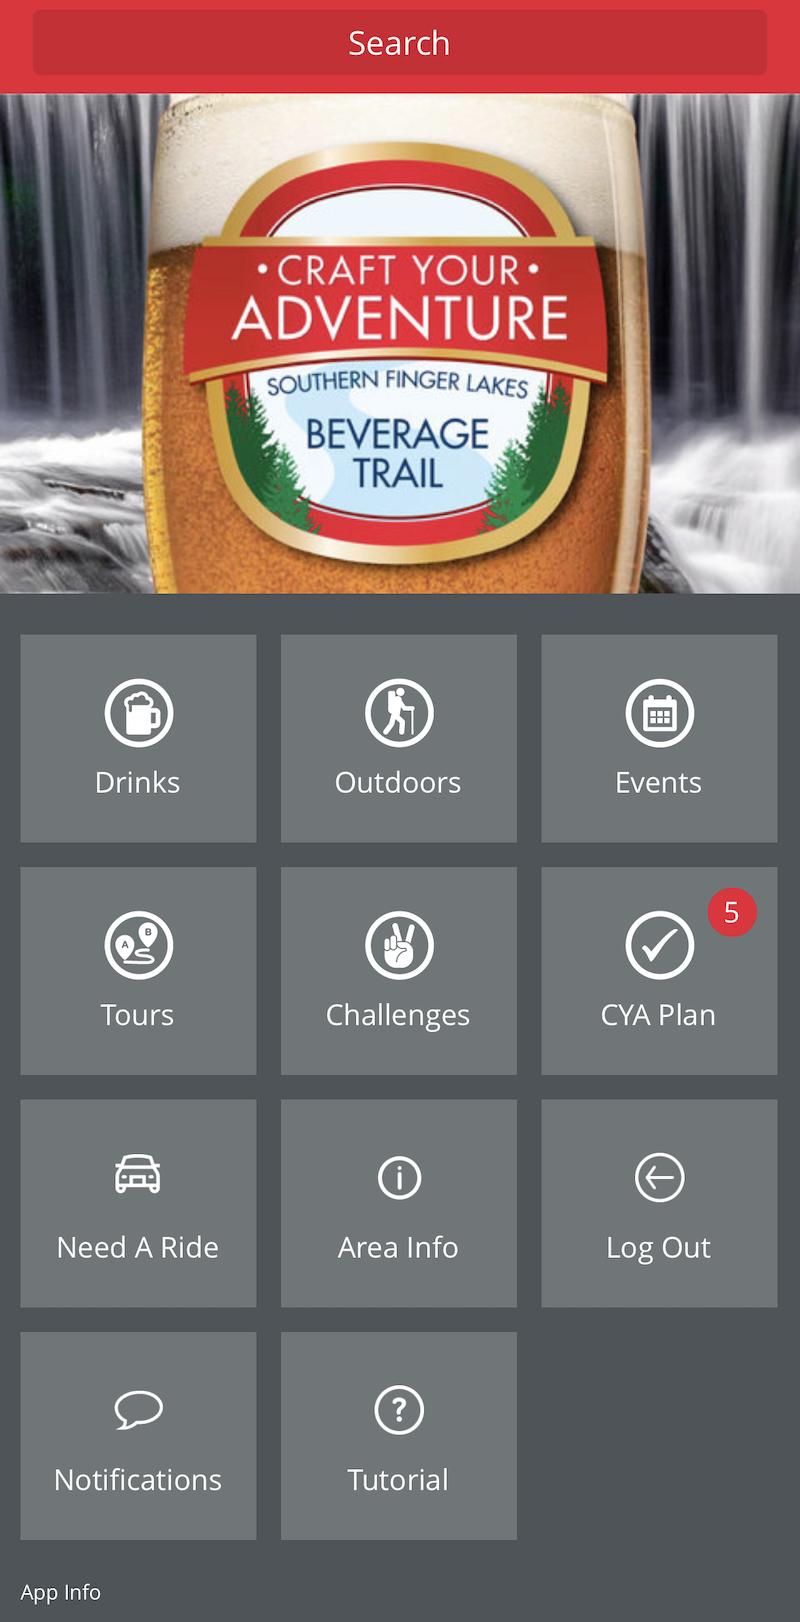 Craft Your Adventure App